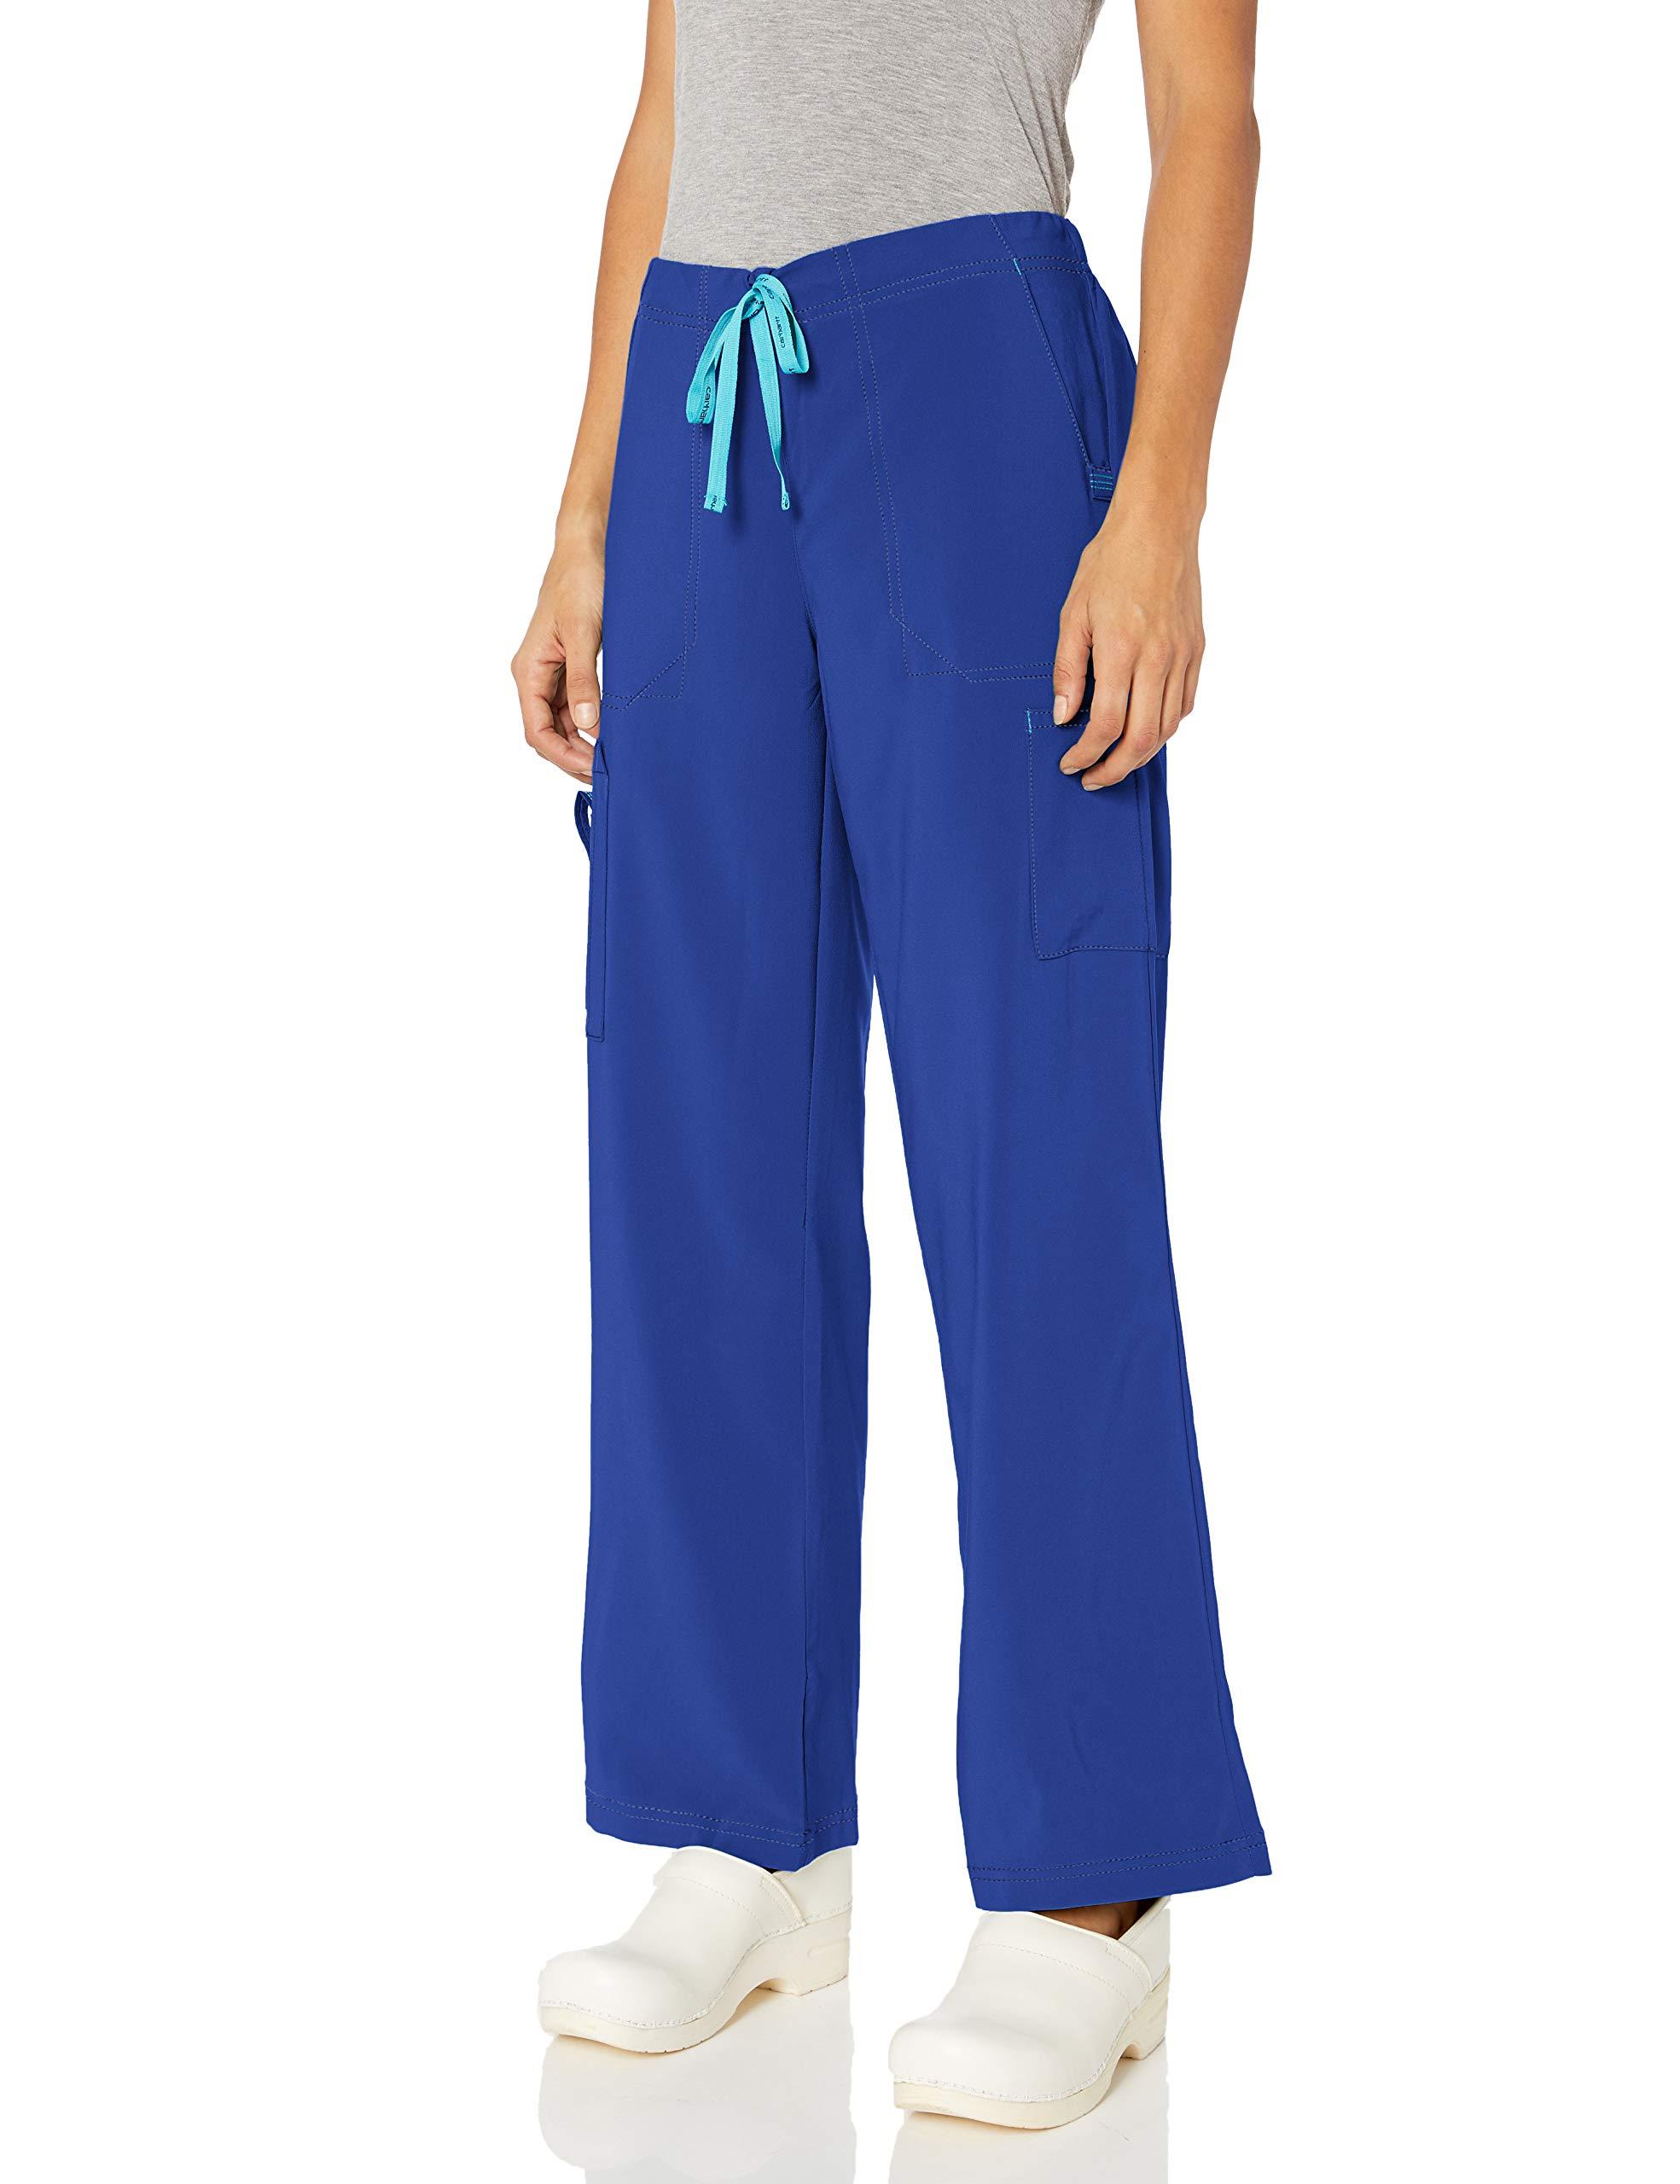 Carhartt Women's Petite Utility Boot Cut Cargo Pant Galaxy Blue XLP